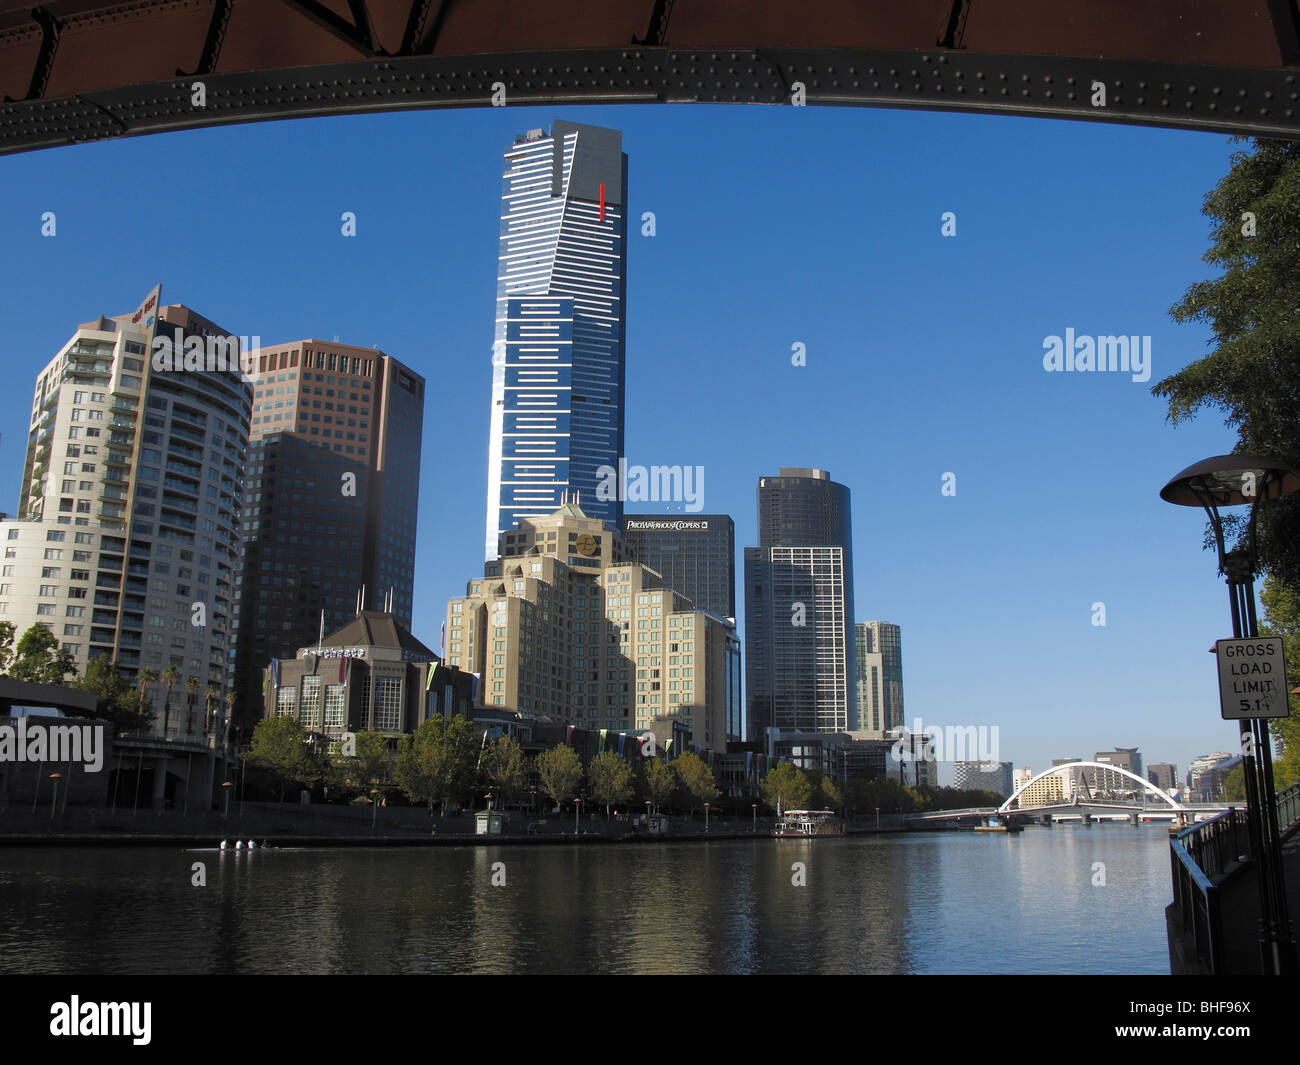 Melbourne's Docklands precinct on the Yarra River framed by the Princes Street Bridge - Stock Image